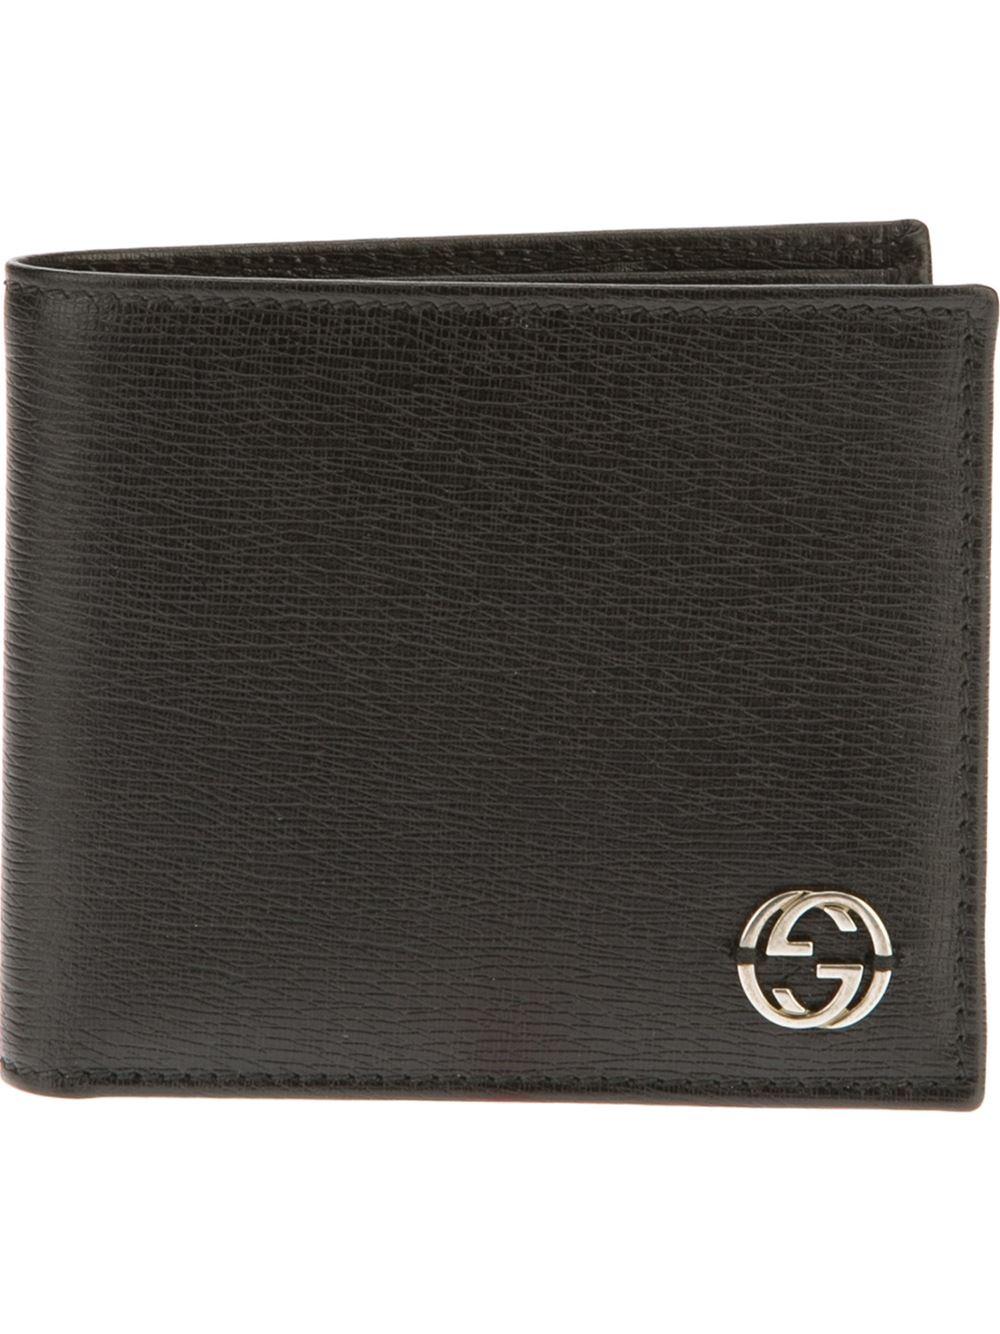 88fd3da1c32 Gucci Male Wallet - Best Photo Wallet Justiceforkenny.Org